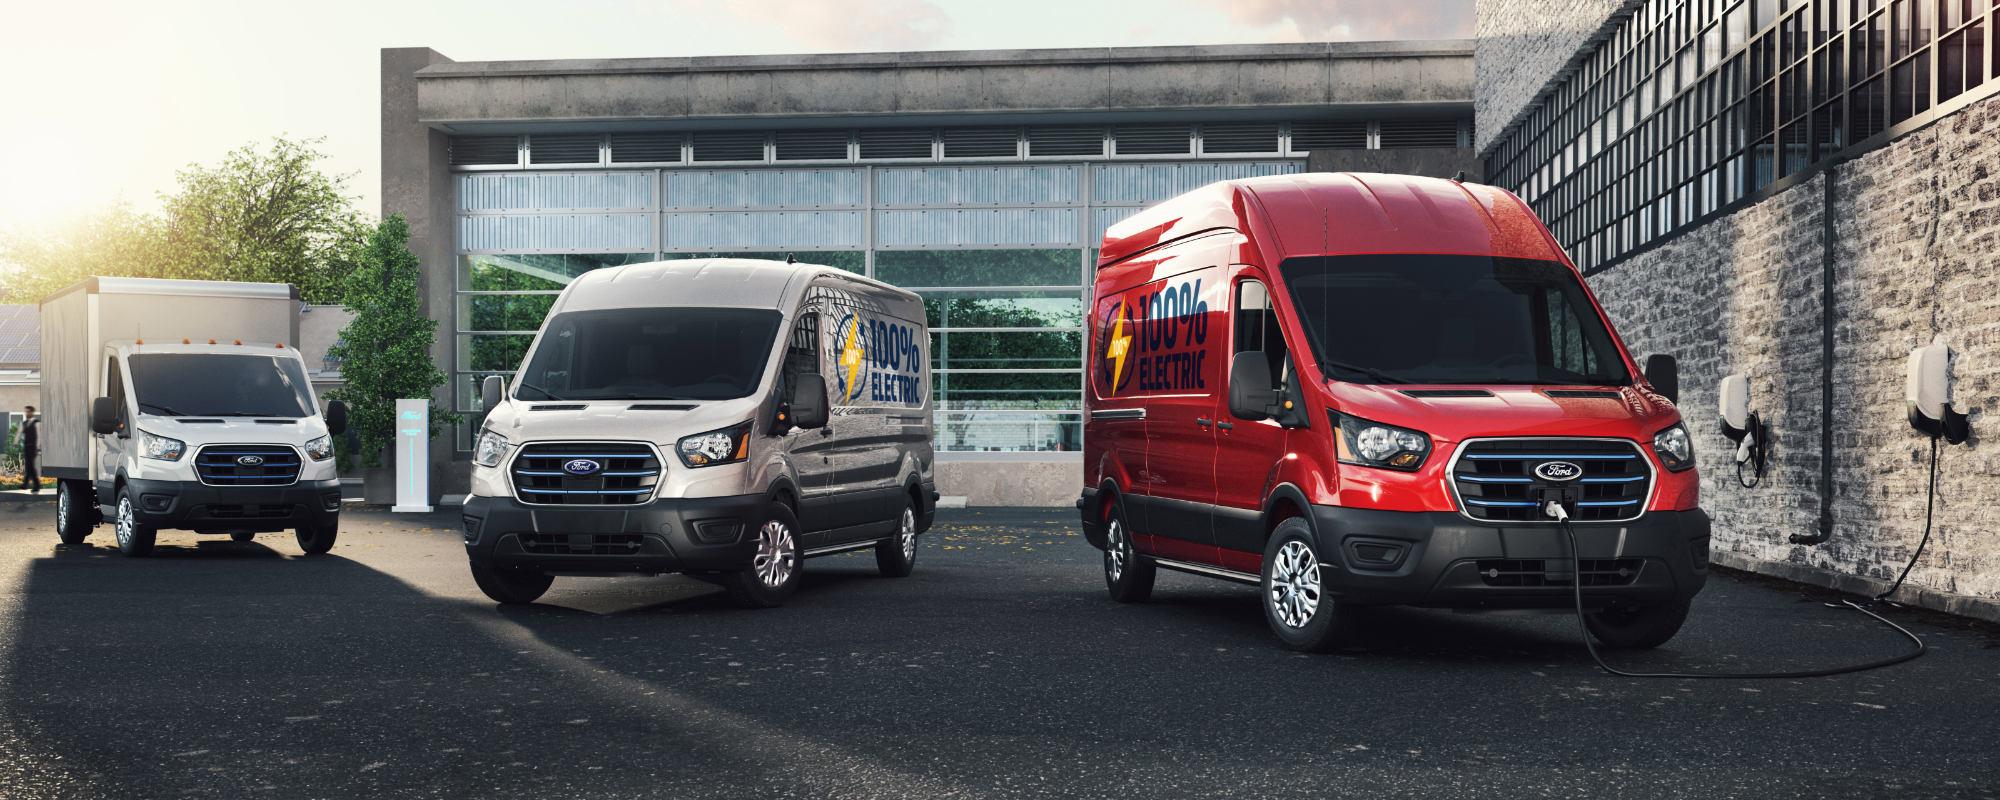 Nye Ford E-Transit